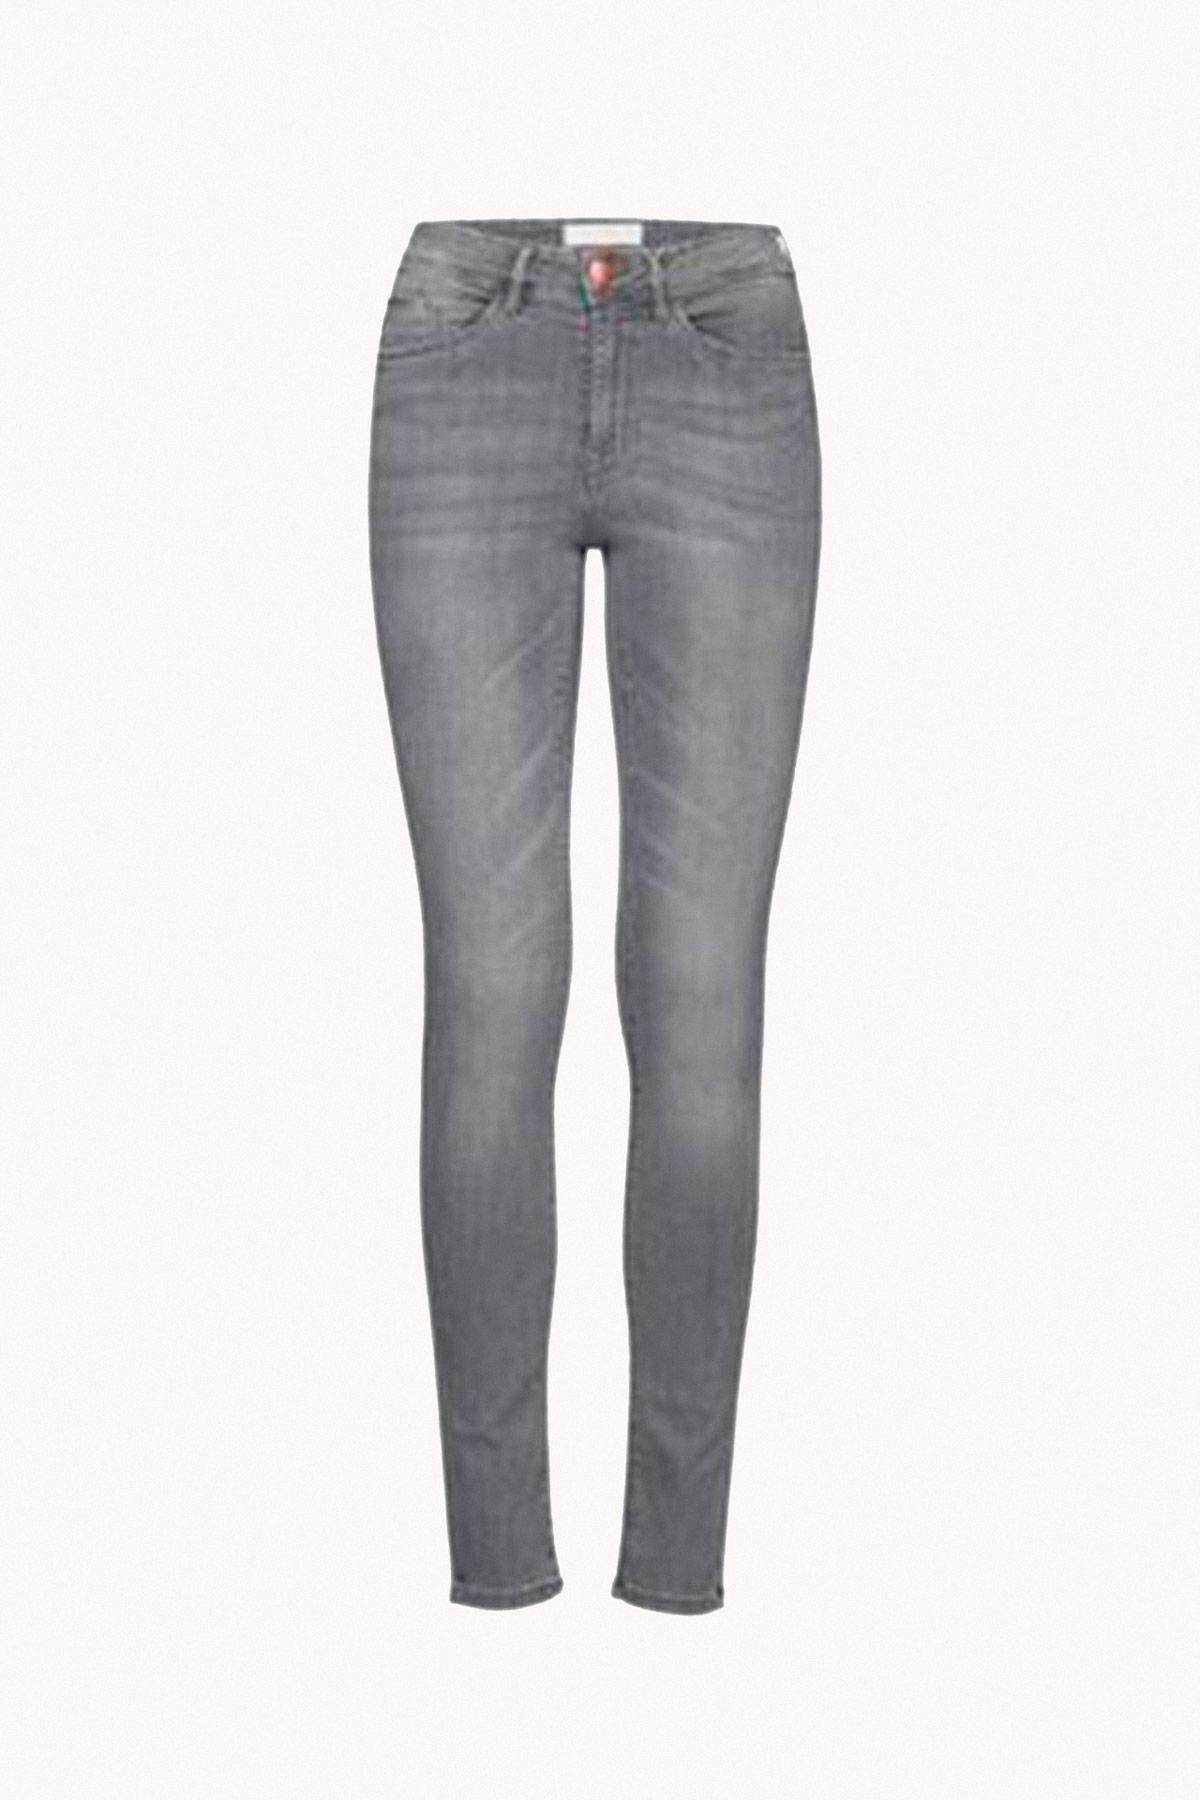 jeans grises armario cápsula